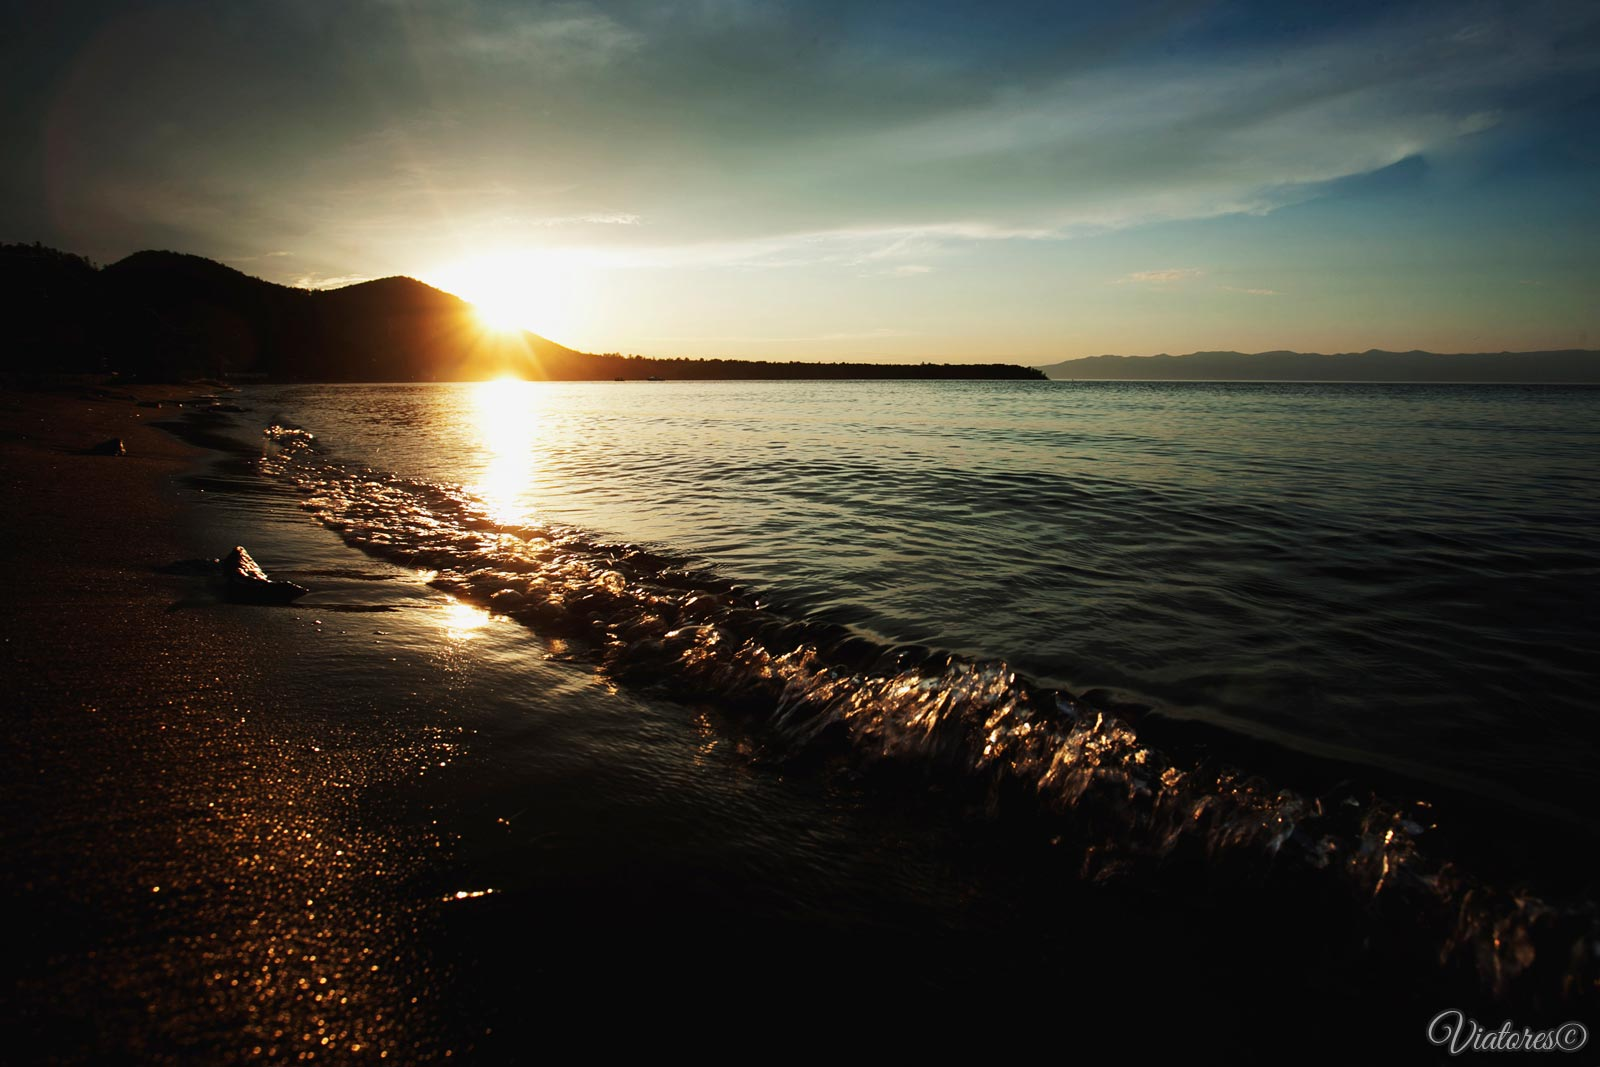 Baikal. Russia